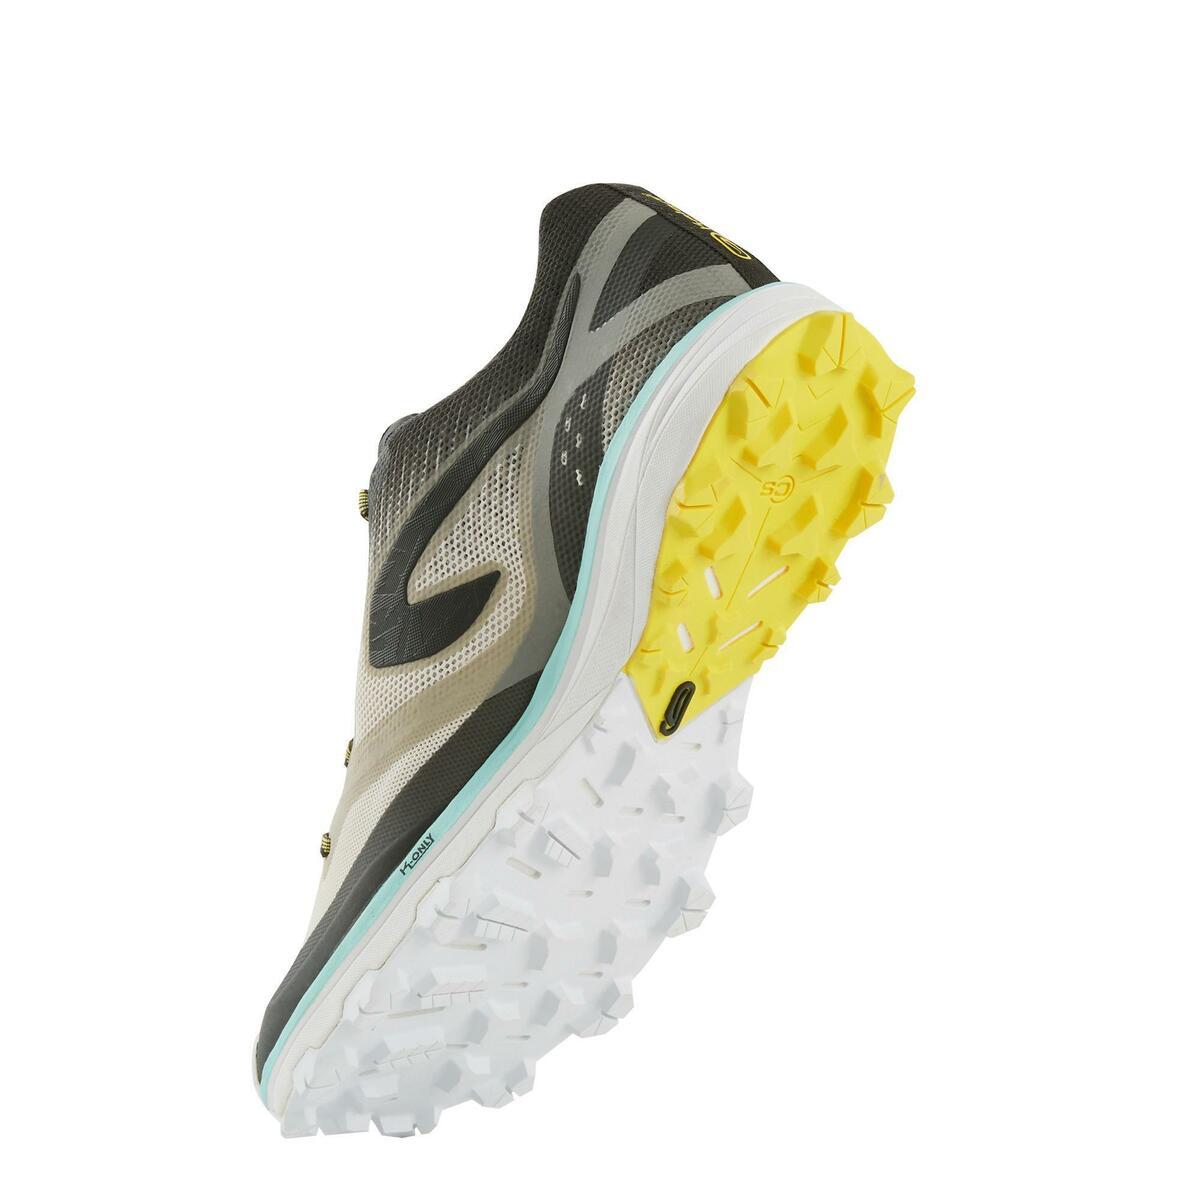 Bild 5 von Laufschuhe Trail Kiprun Race 4 Damen grau/gelb